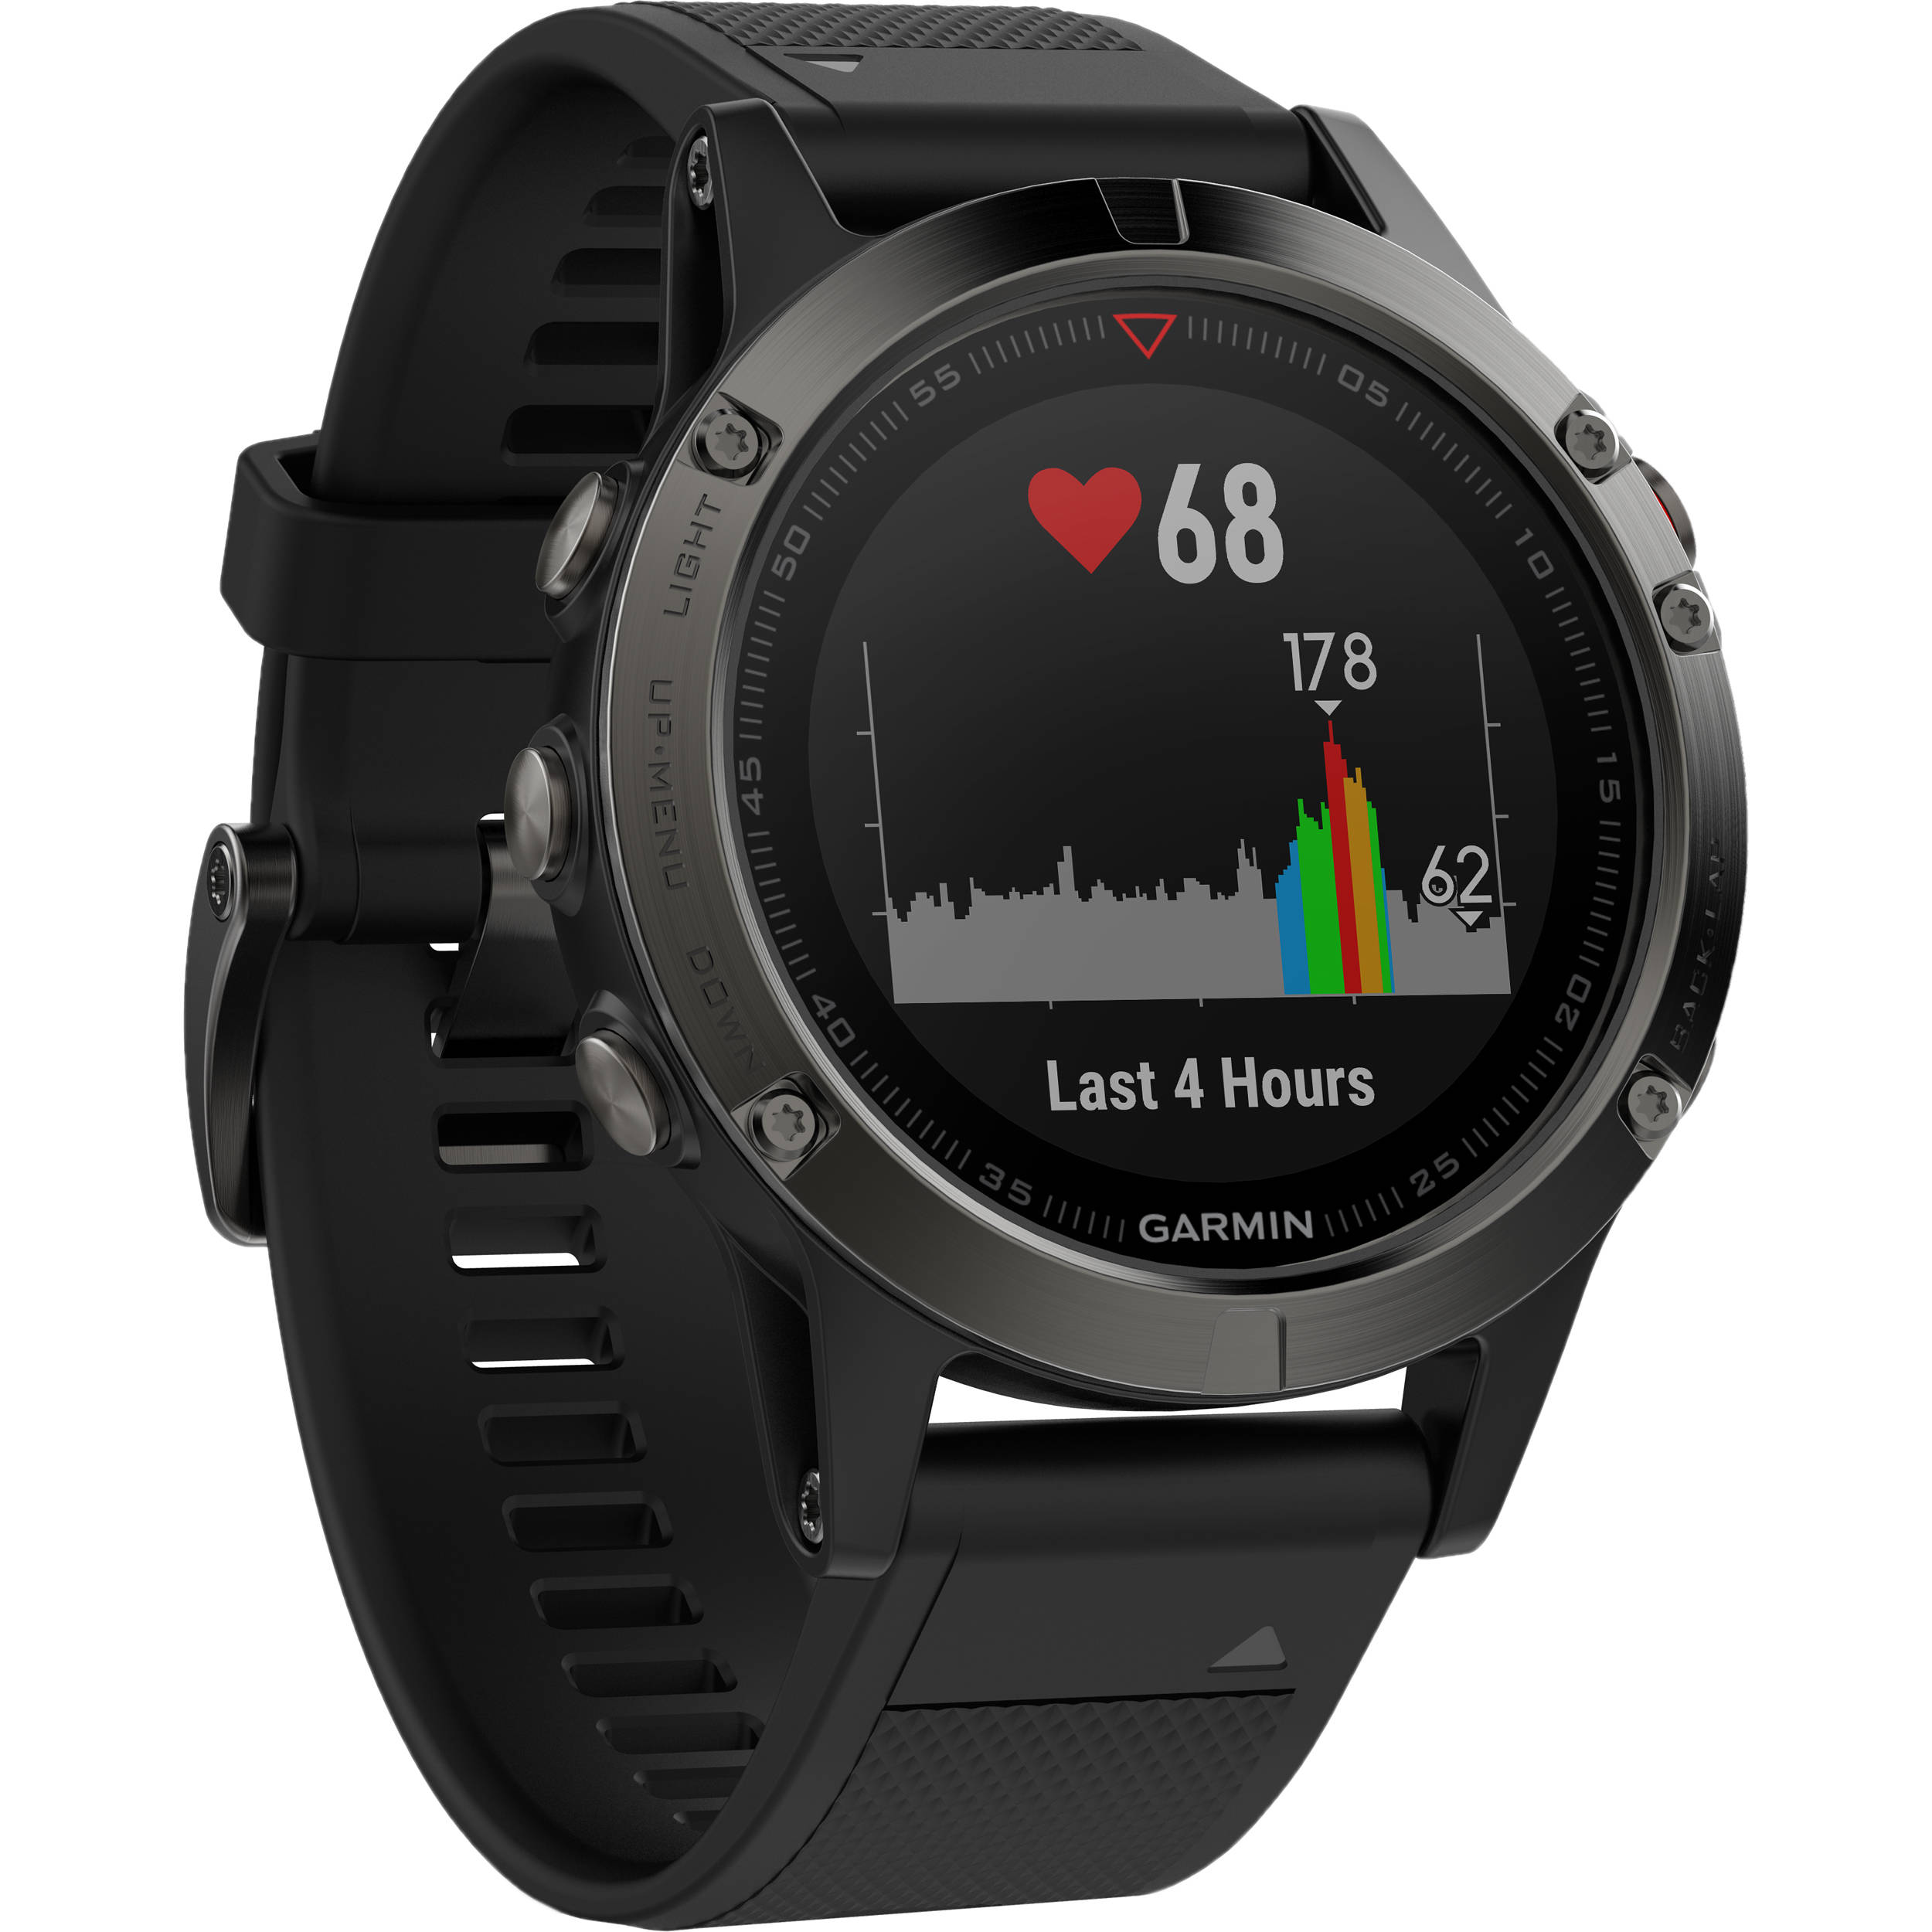 Garmin Fenix 5 Multi Sport Training Gps Watch Slate Gray Black Band